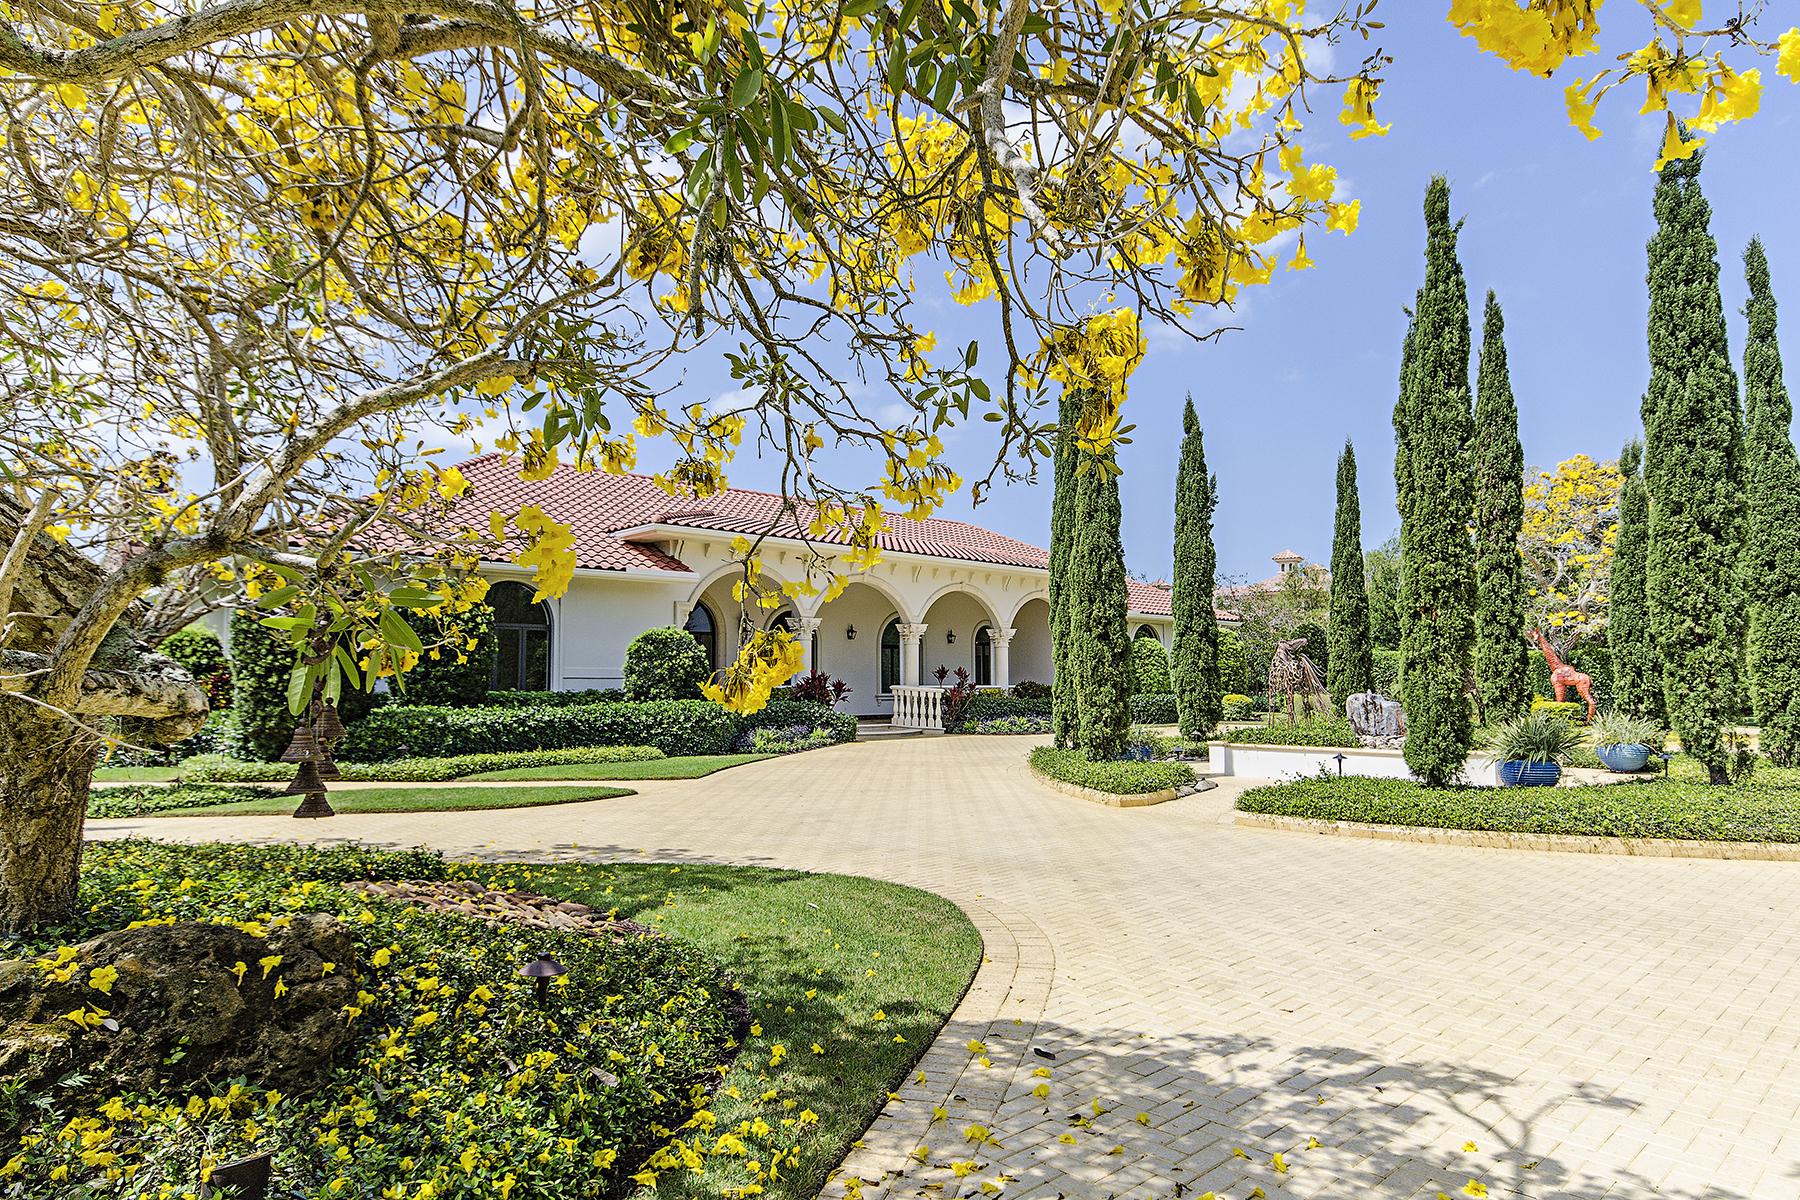 Villa per Vendita alle ore 196 Eugenia Dr , Naples, FL 34108 196 Eugenia Dr Naples, Florida, 34108 Stati Uniti